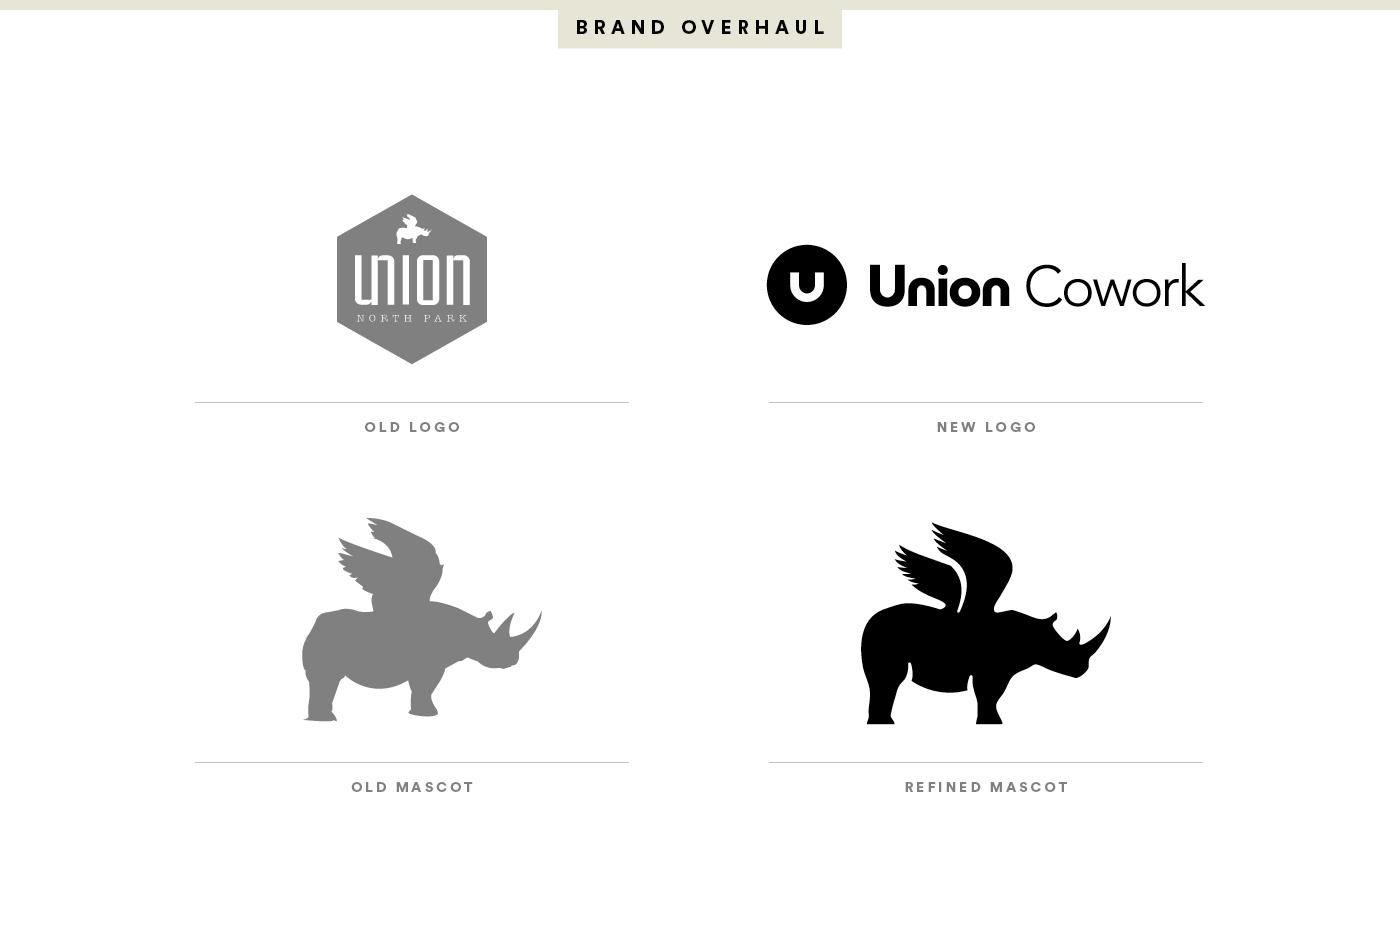 coworking wordpress community ILLUSTRATION  appareldesign Sandiego corporateidentity cinemagraph brand interactive